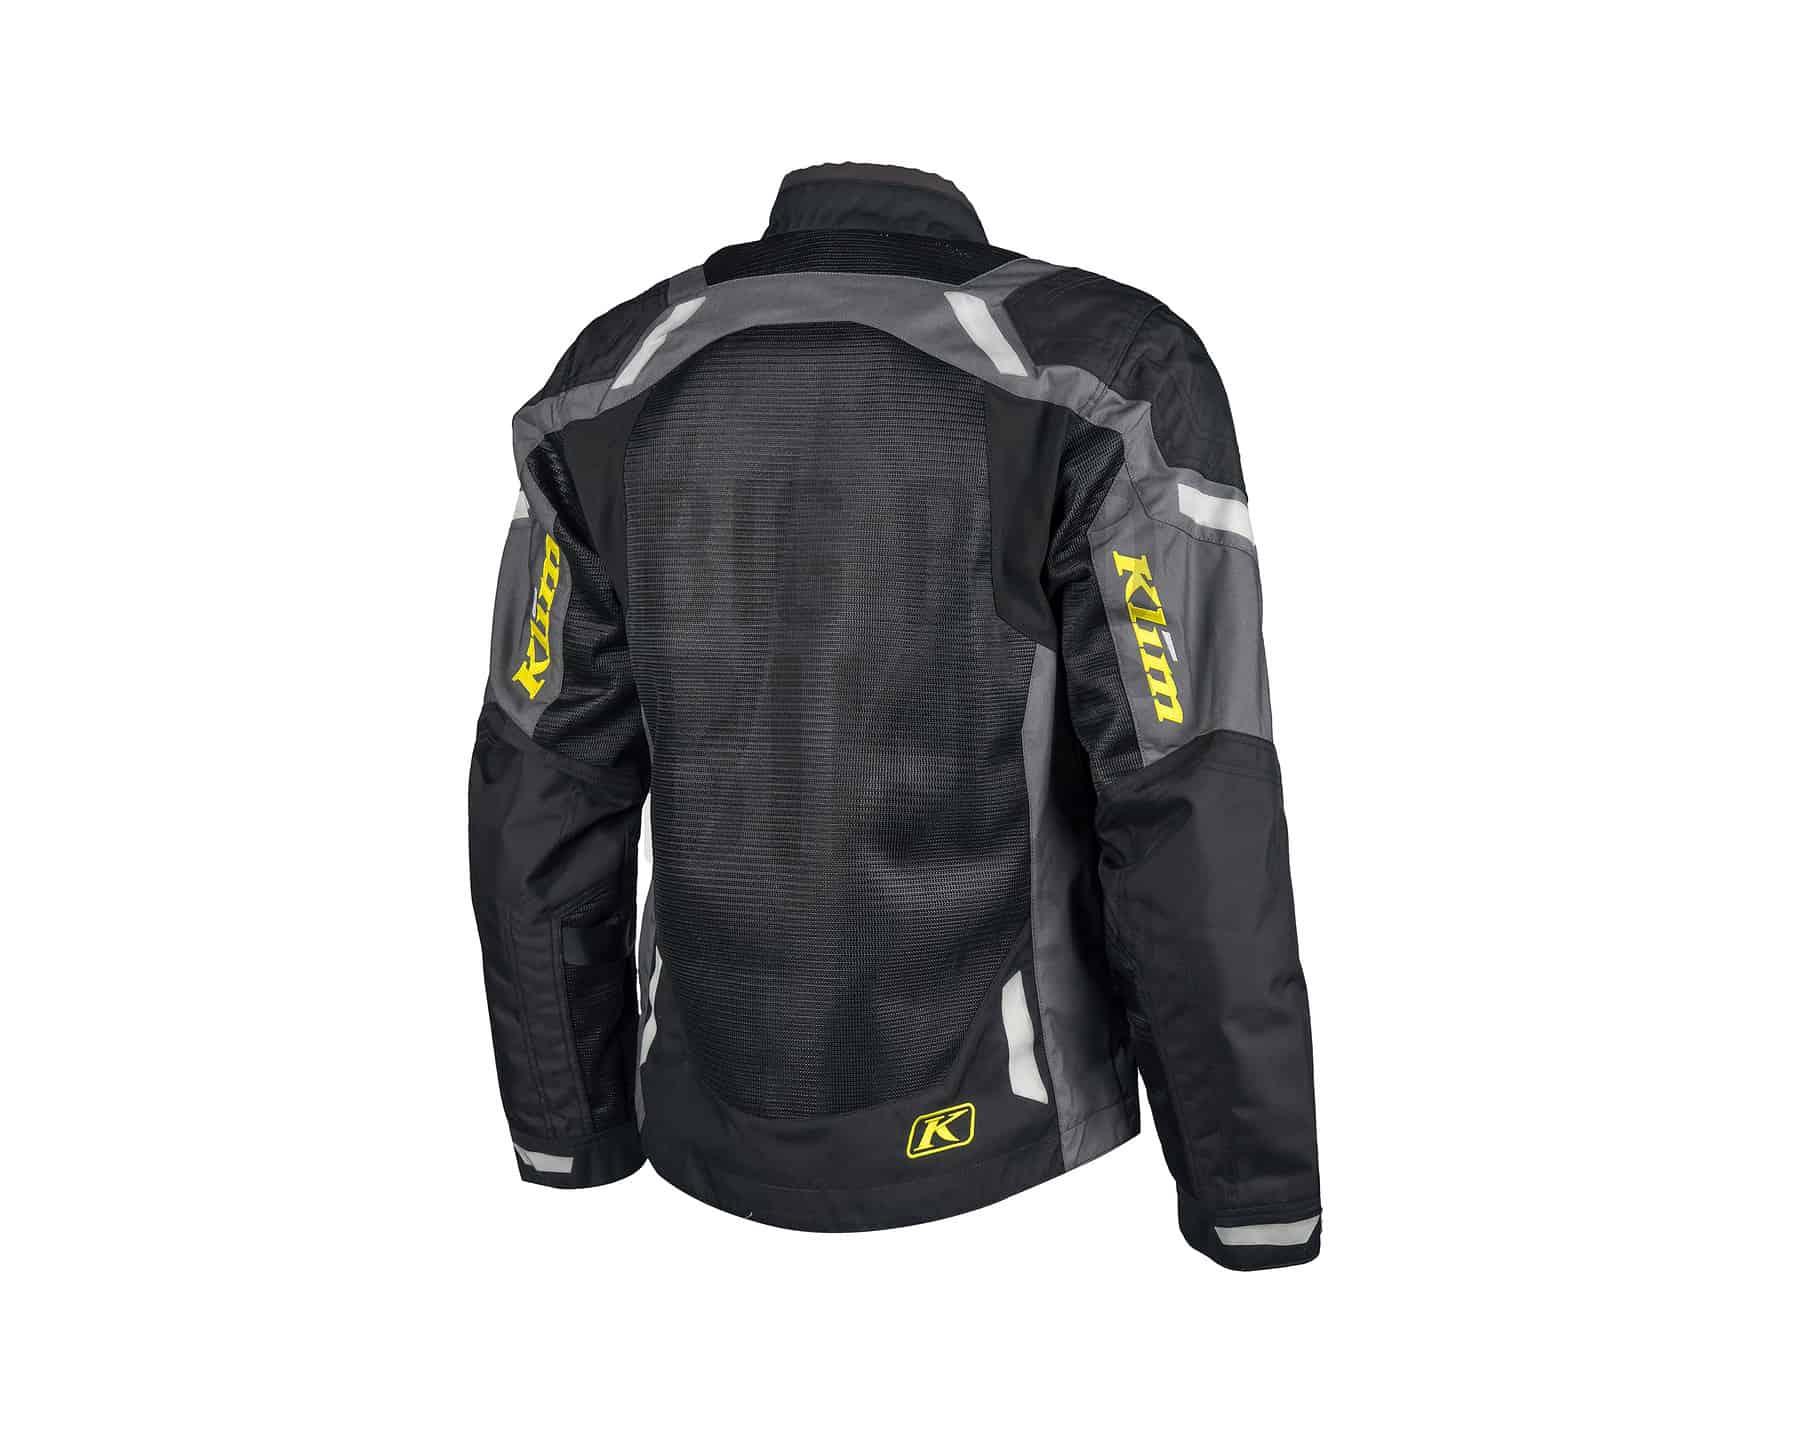 Induction Jacket_5060-002_Dark Gray_06